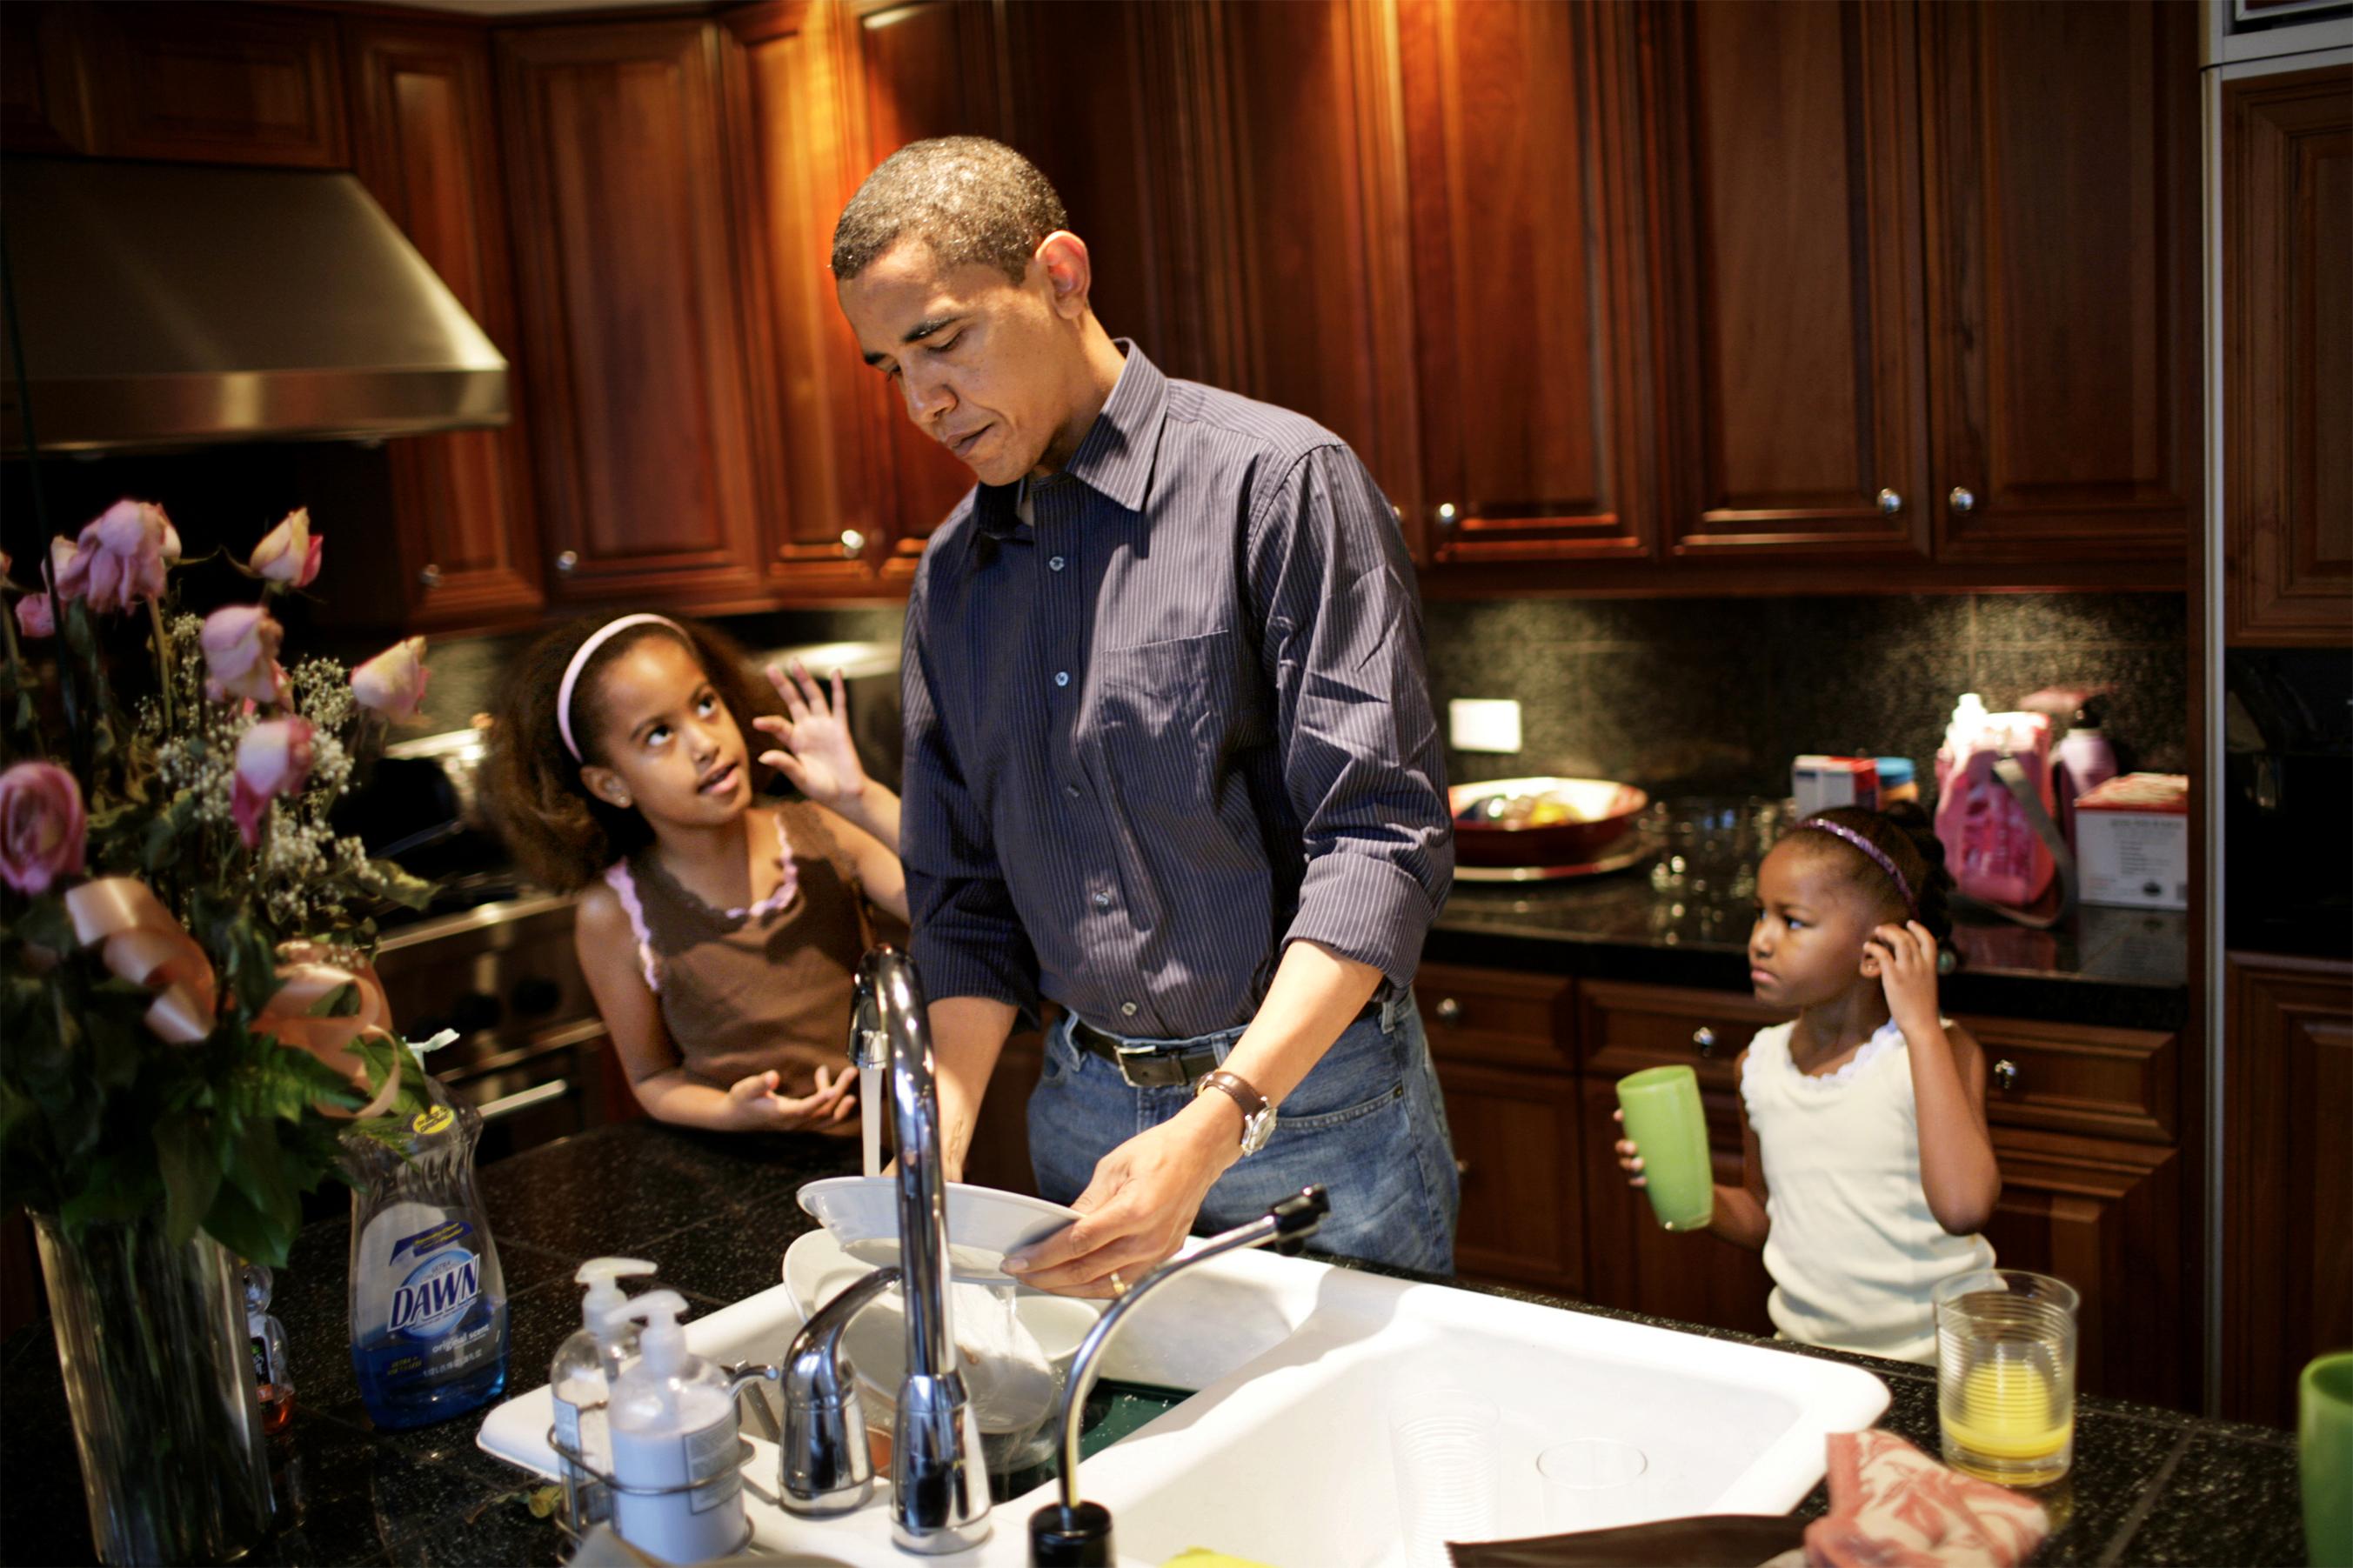 015 Obama Essay Potusessayimage4 Marvelous President Research Paper Barack Pdf Michelle Full